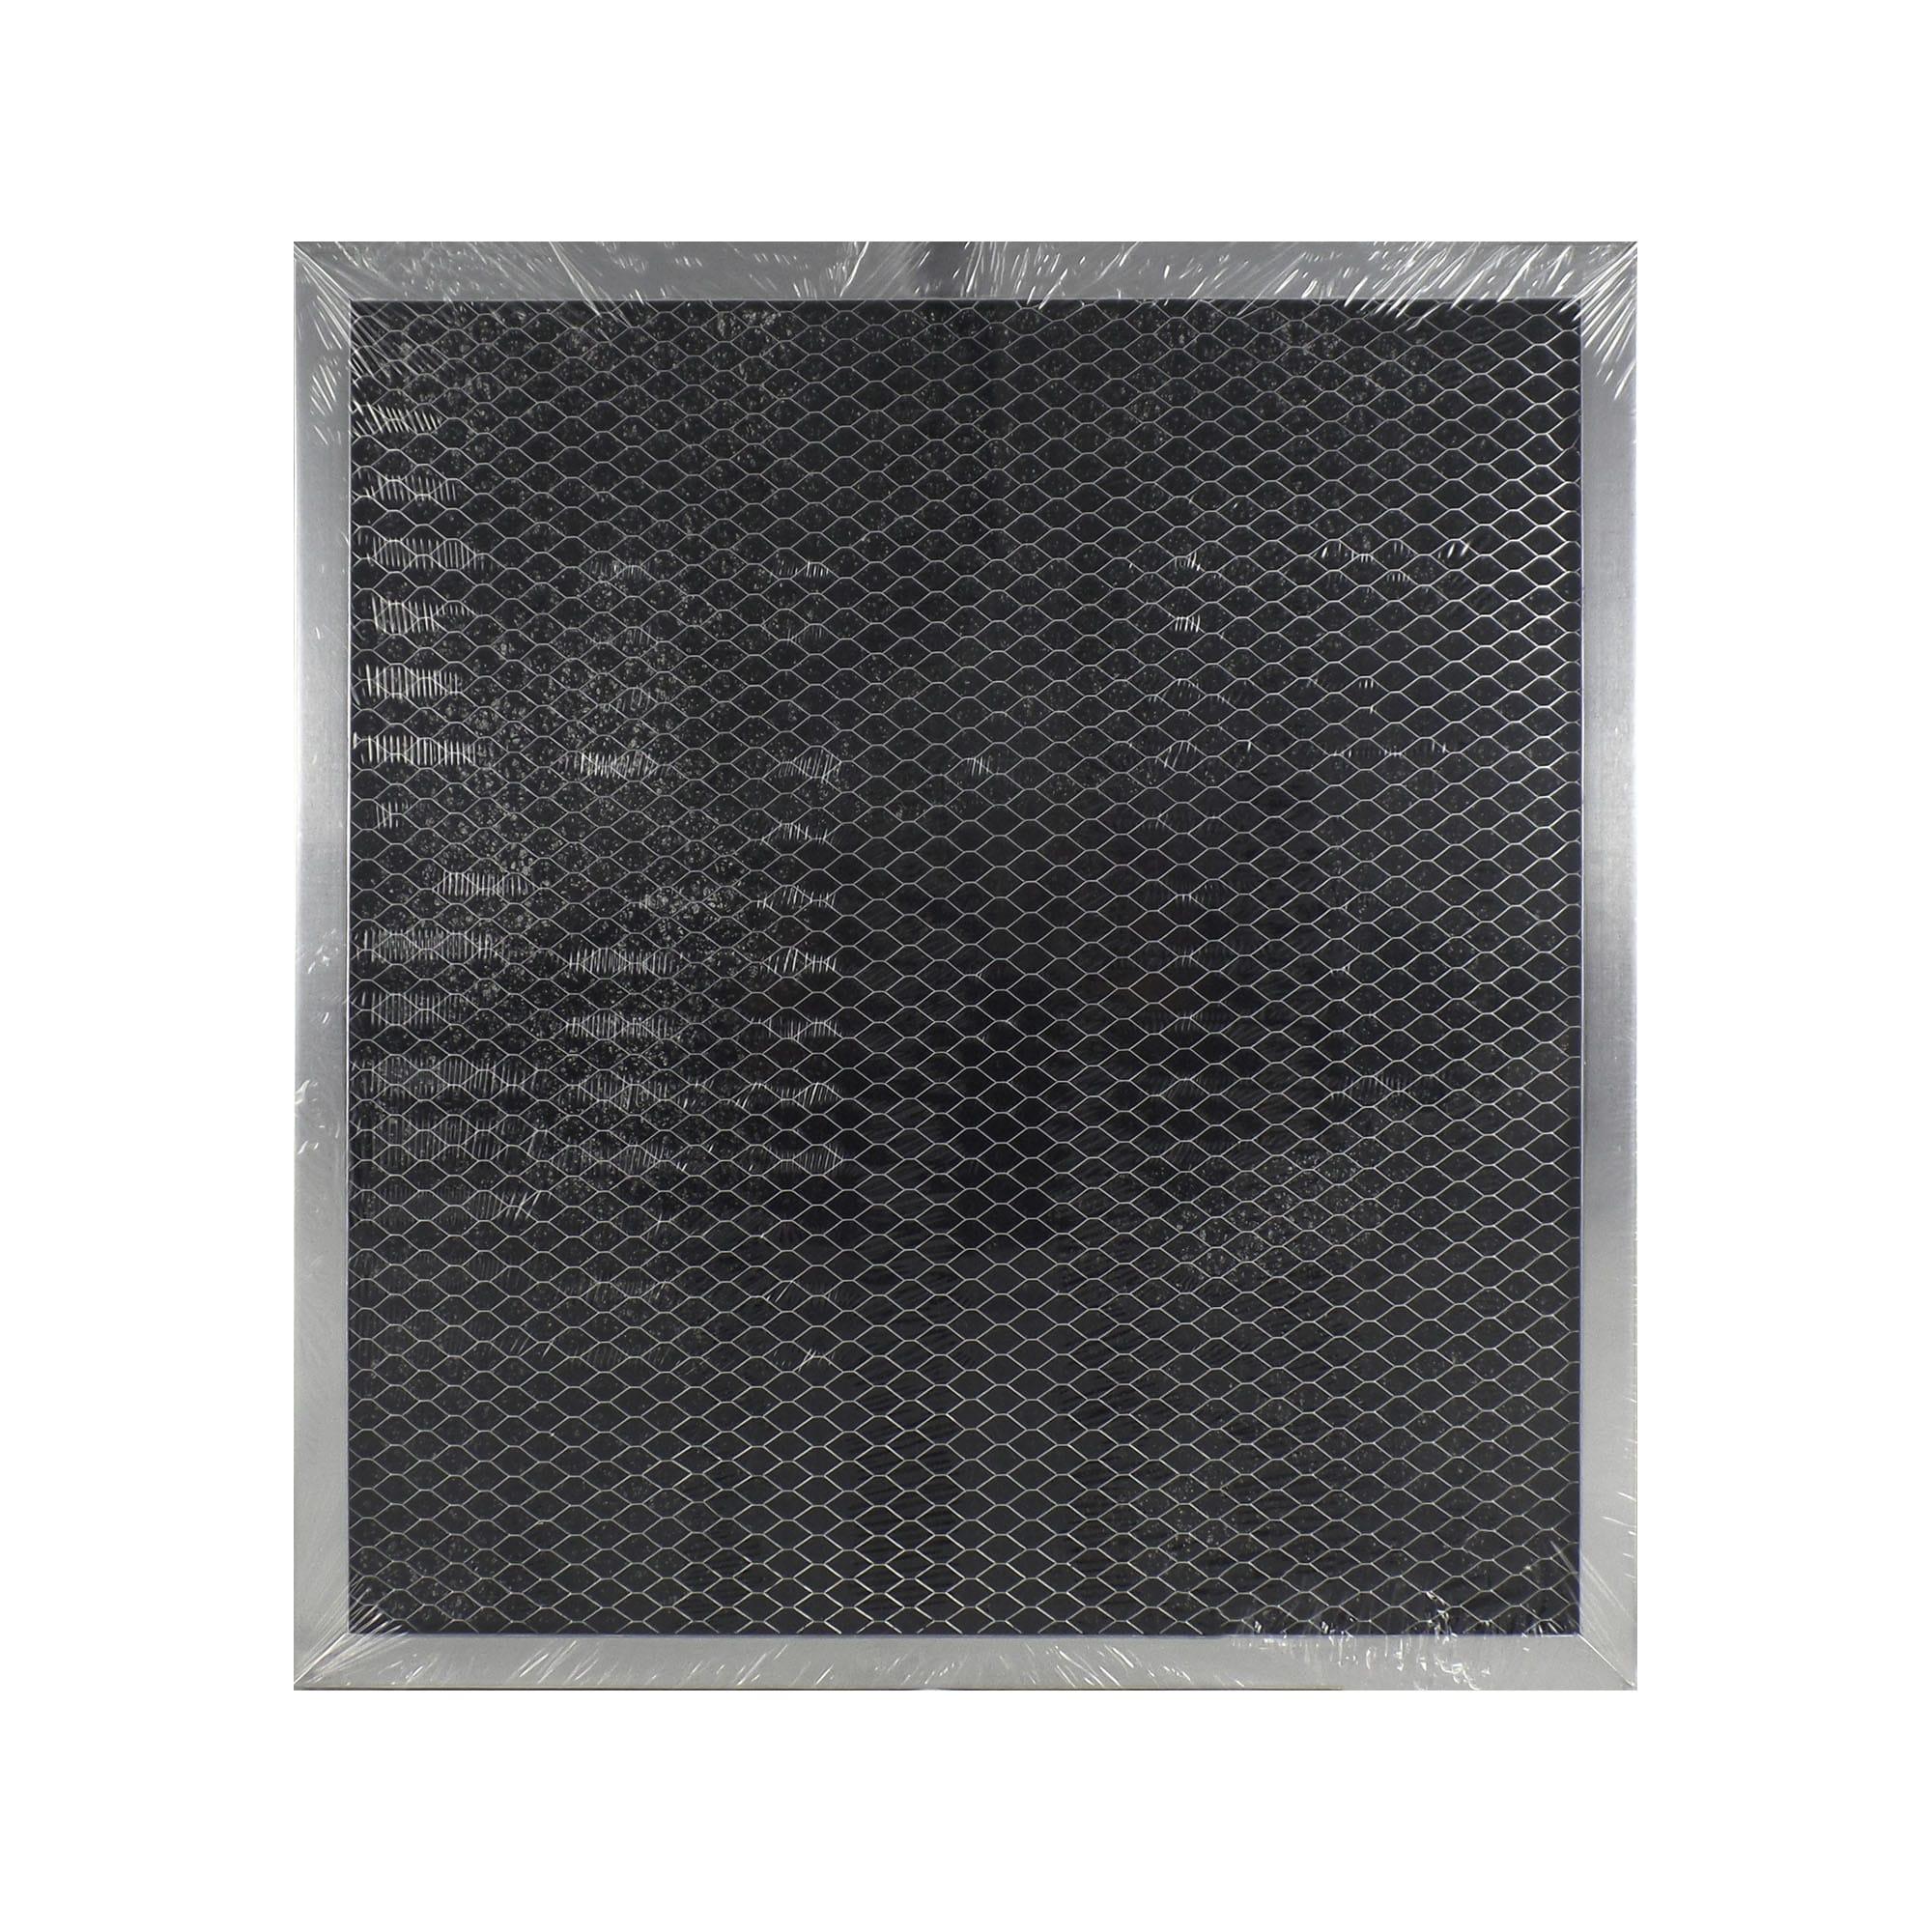 Jn322 Hot Point Charcoal Carbon Range Hood Filter Part Jn322